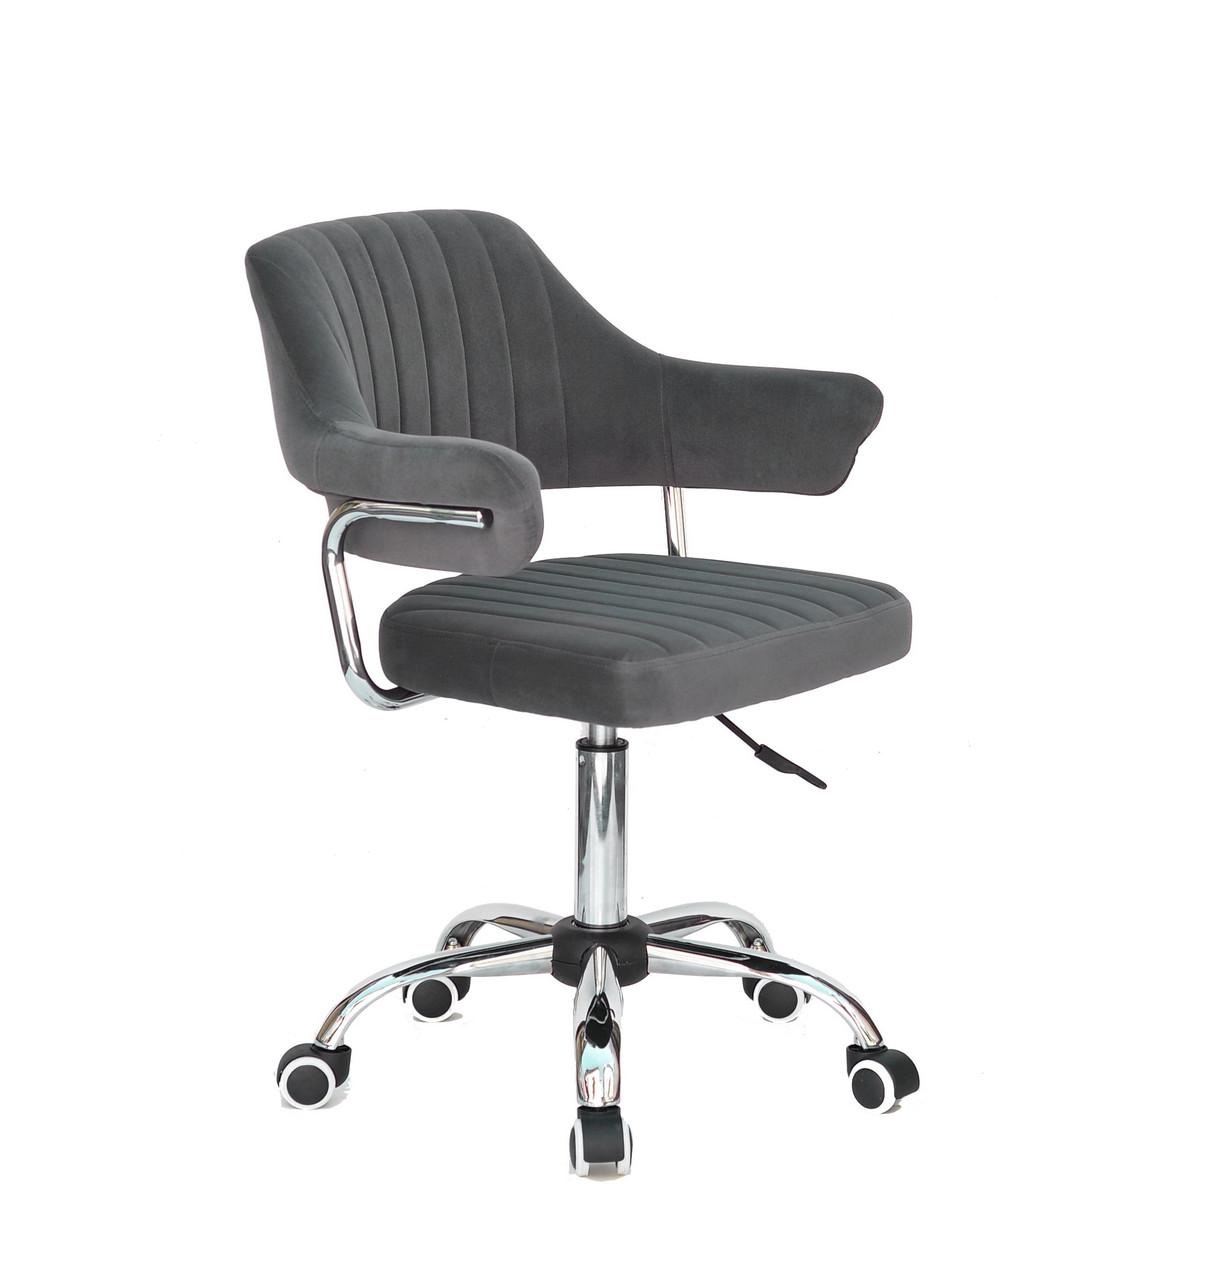 Кресло мастера Джеф JEFF CH - OFFICE серый бархат, на колесах